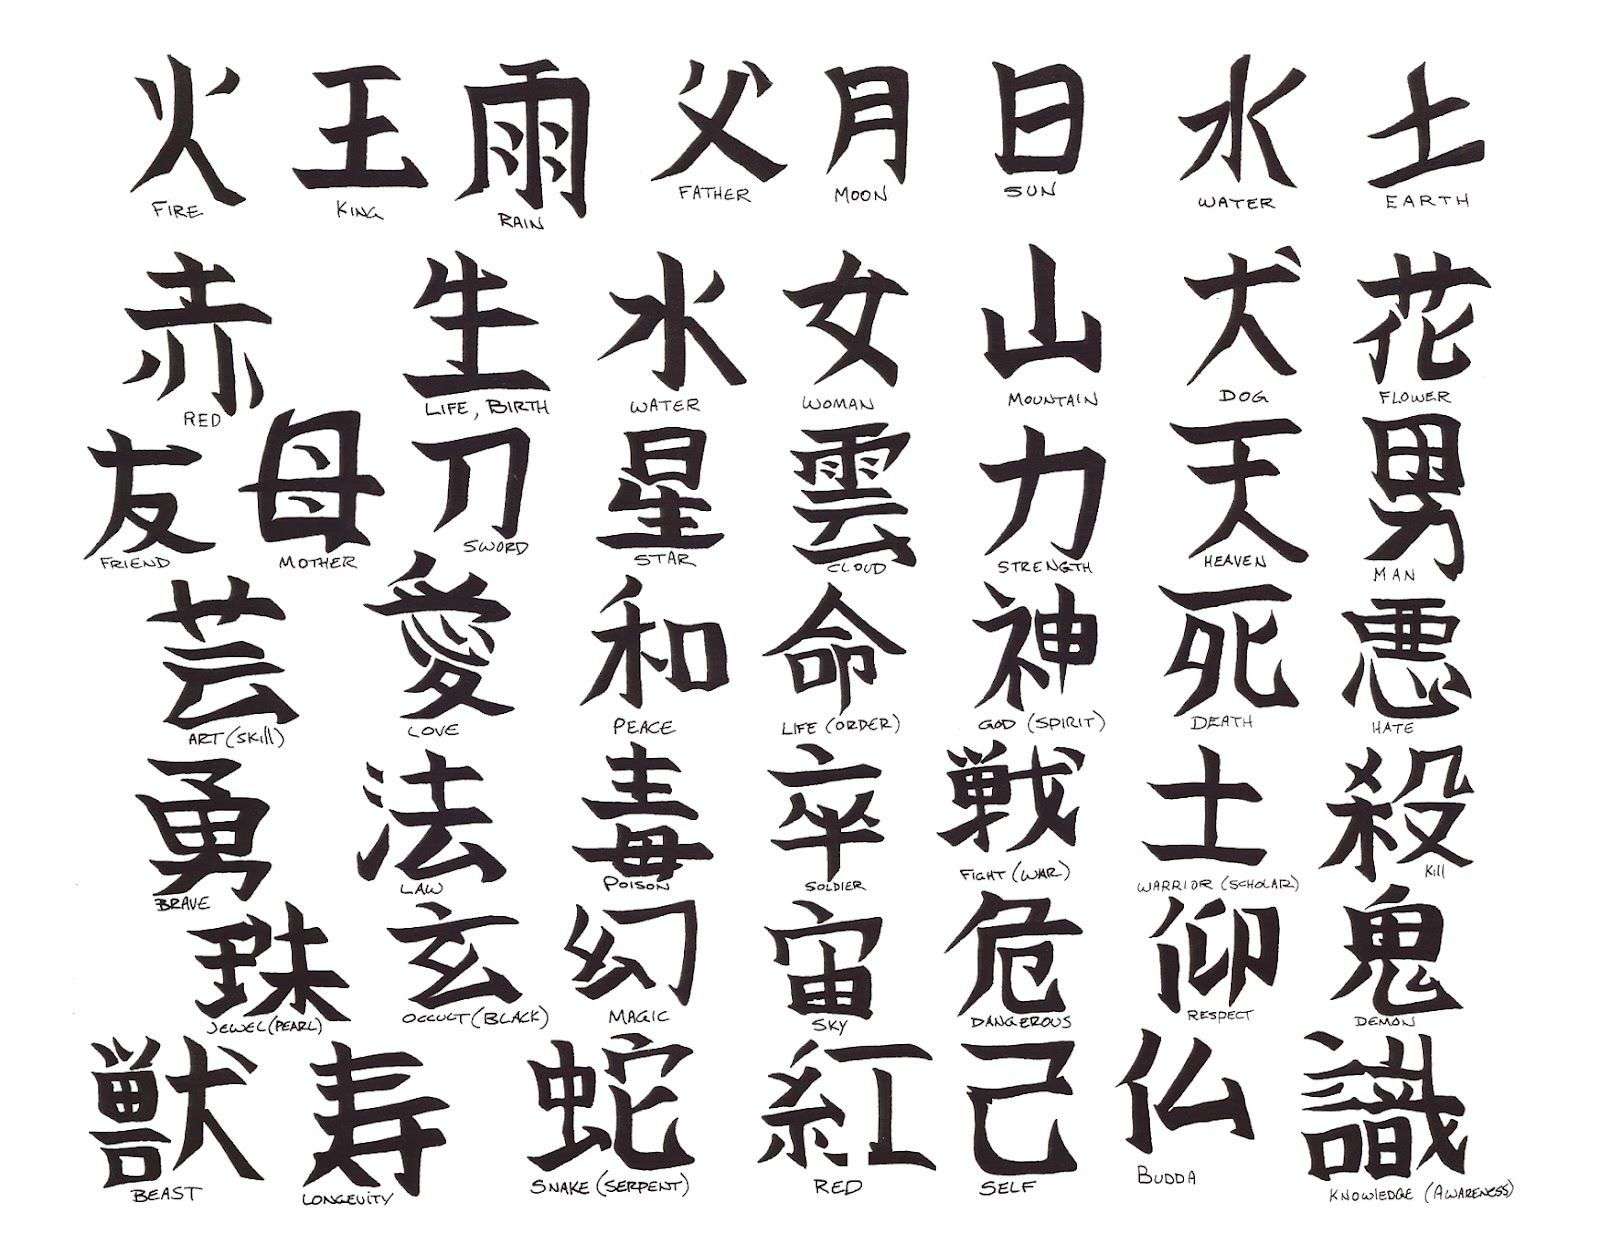 Chinese alphabets everything china pinterest chinese alphabets biocorpaavc Images